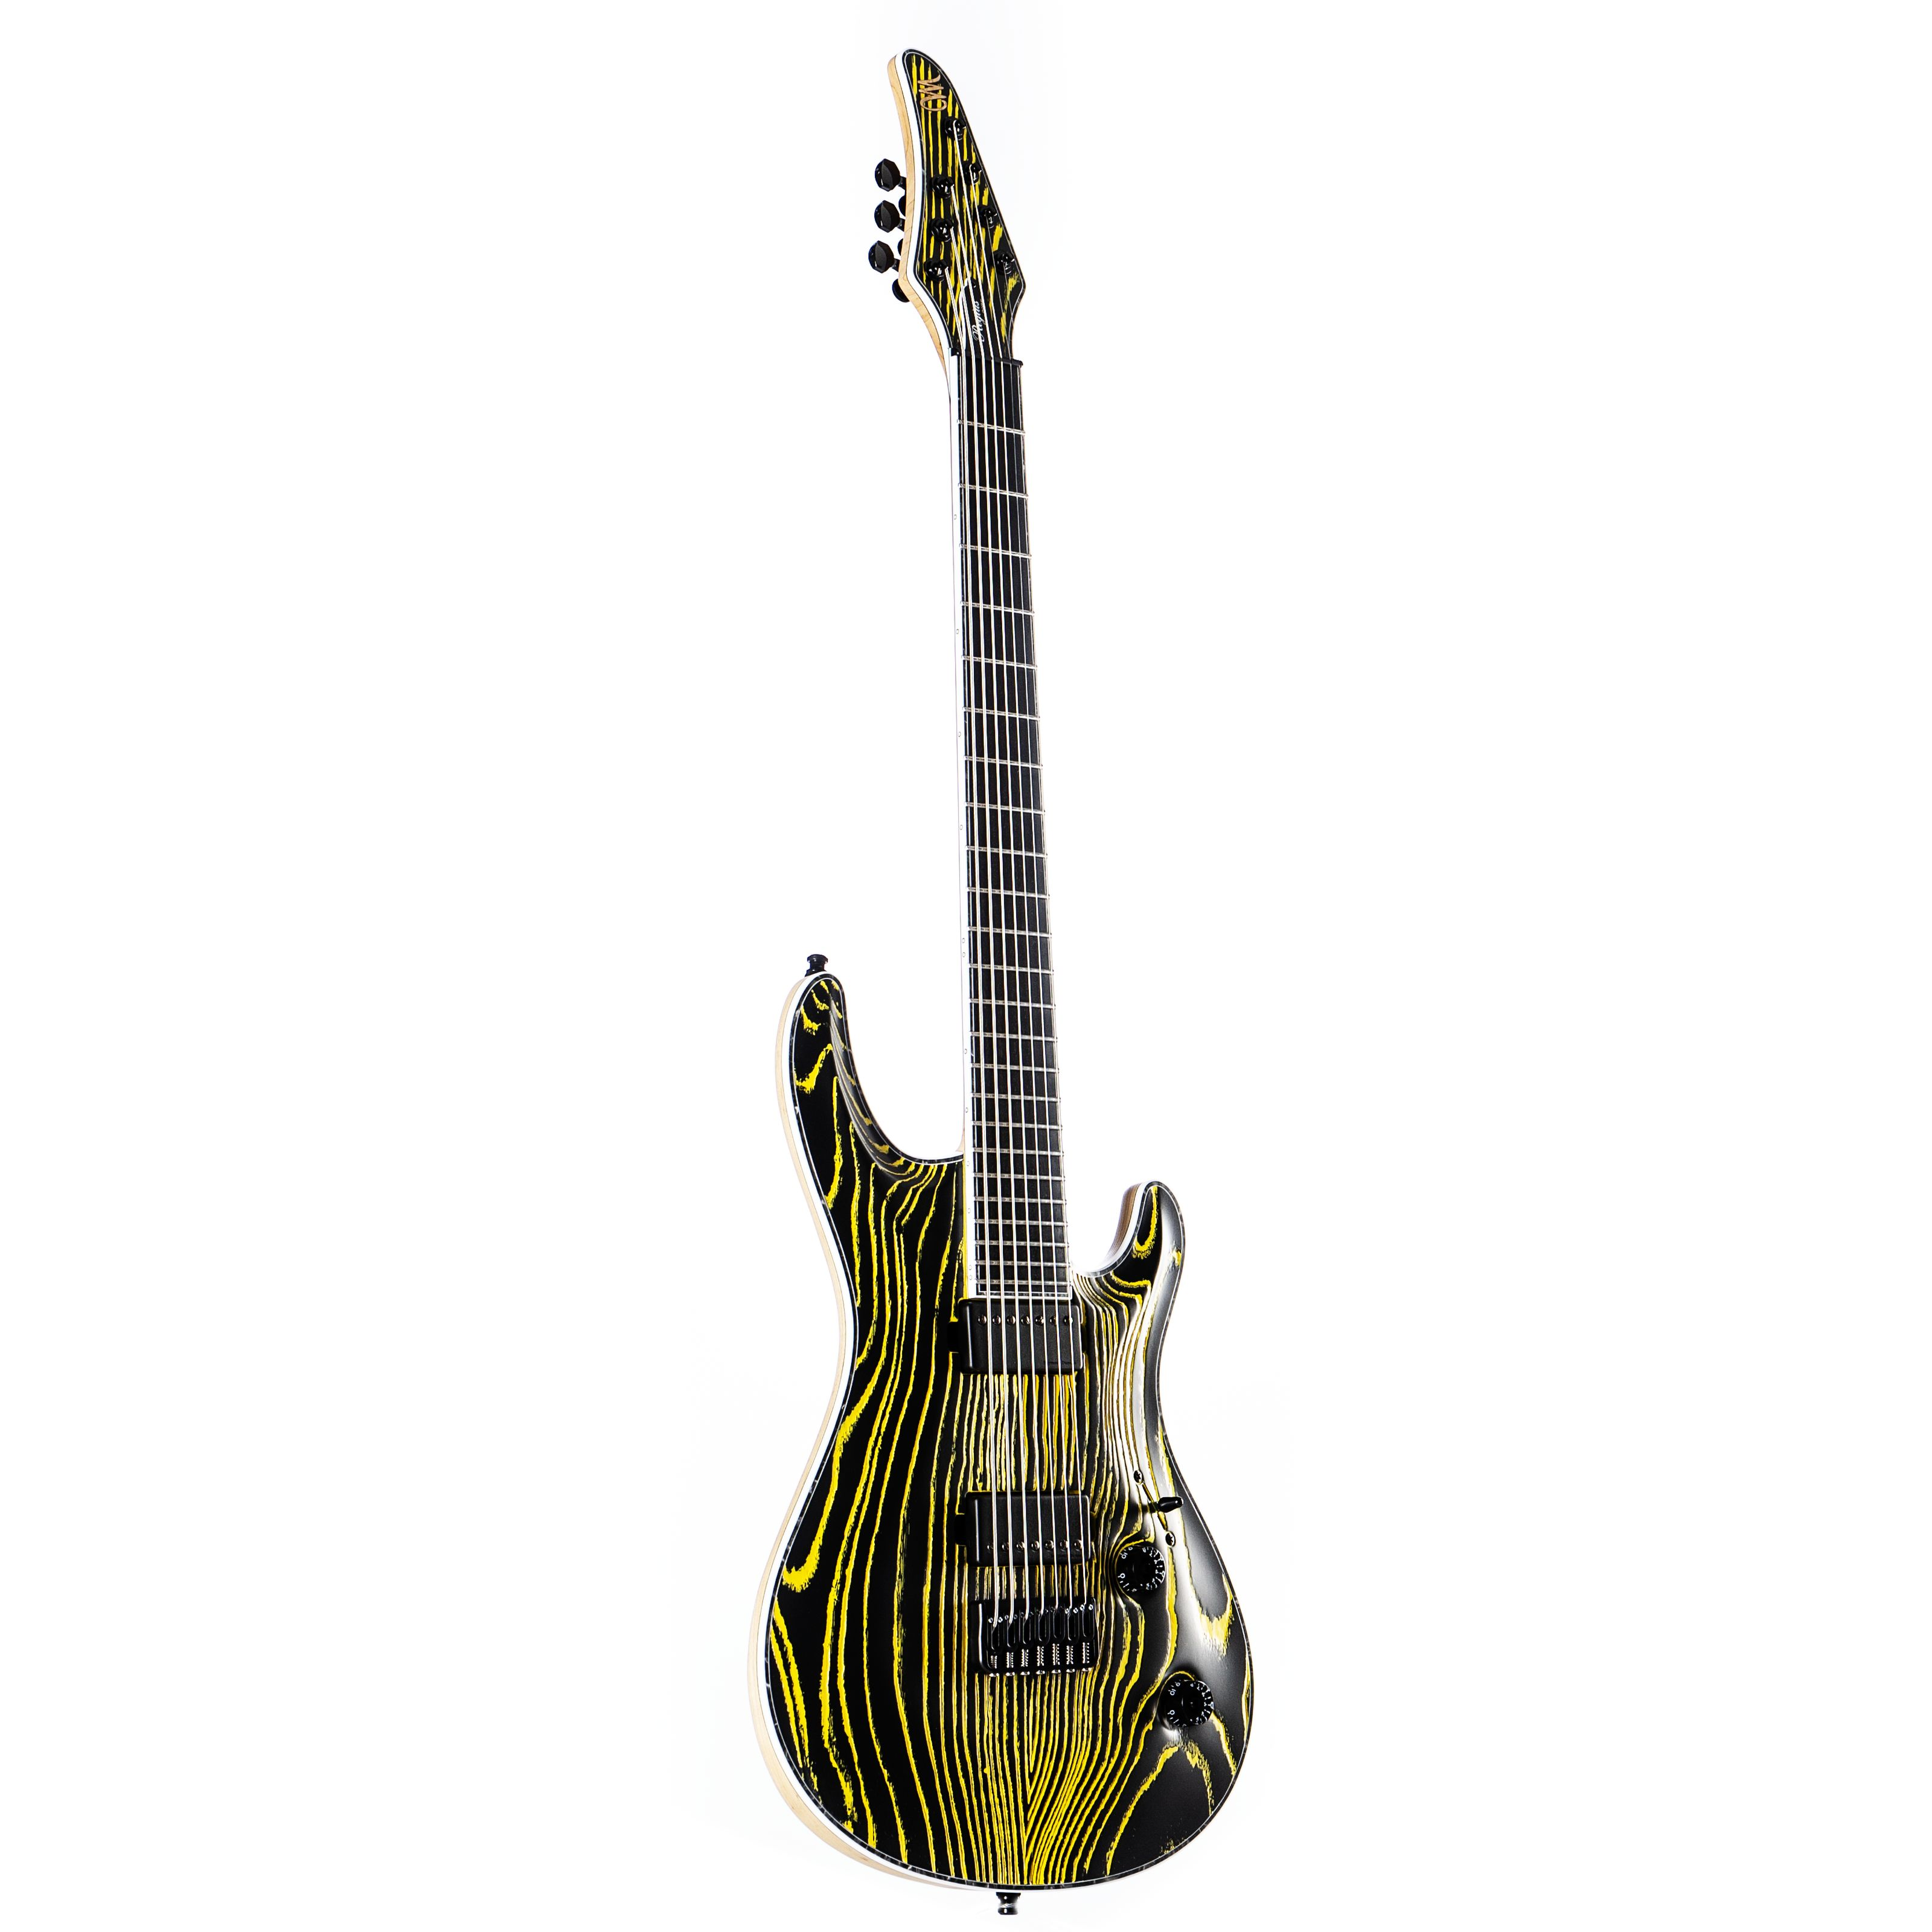 Mayones - Regius Core Gothic 7 Baritone Gothic Black Pored Yellow